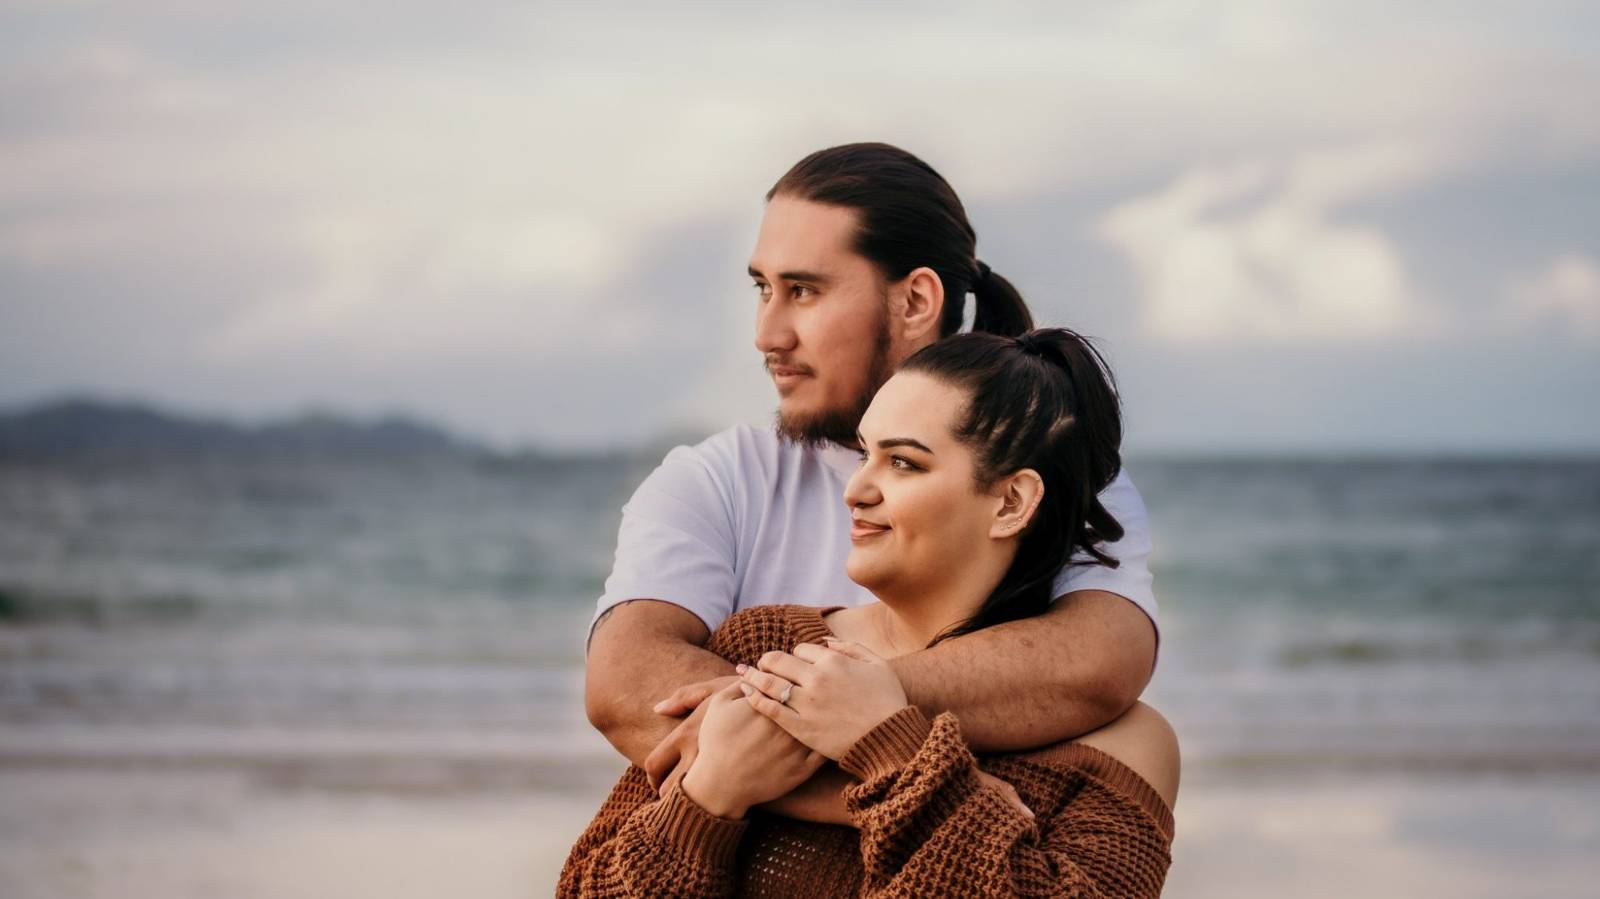 Māori and Pasifika 'disadvantaged' by BMI fertility treatment rules